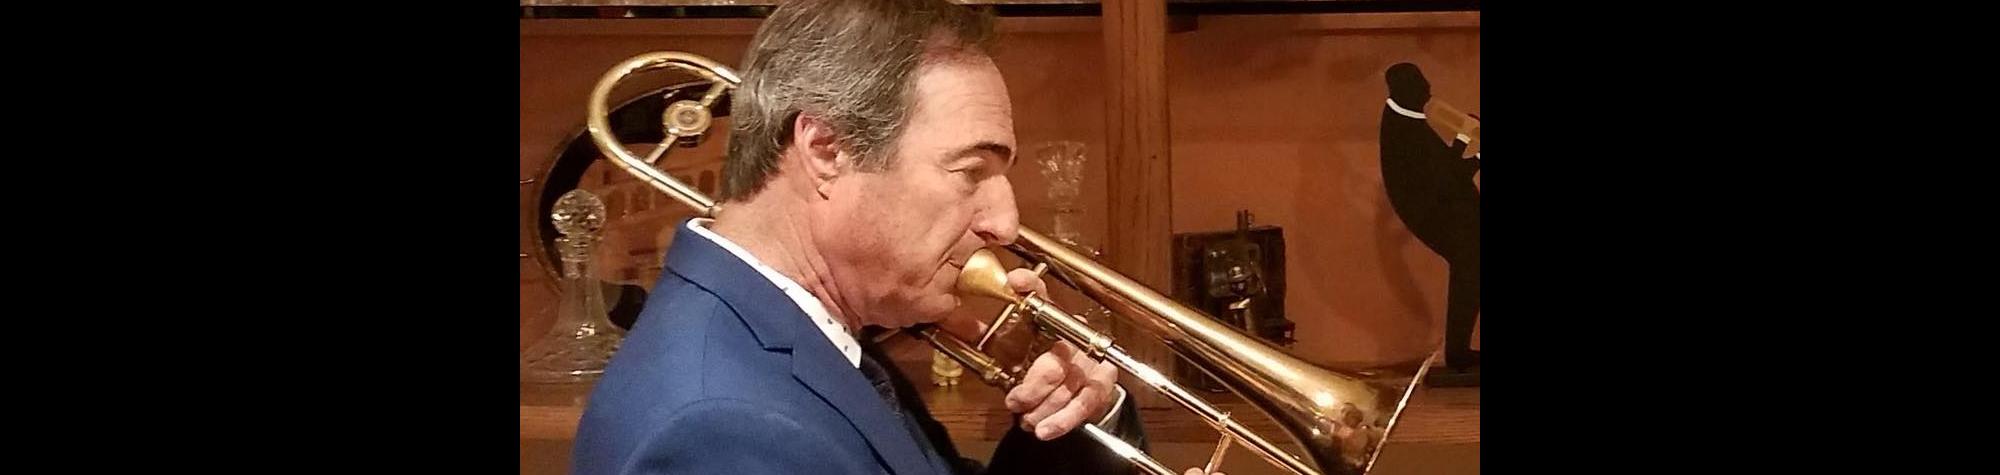 Alan Kaplan Trombone Interview – Trombone Corner #7